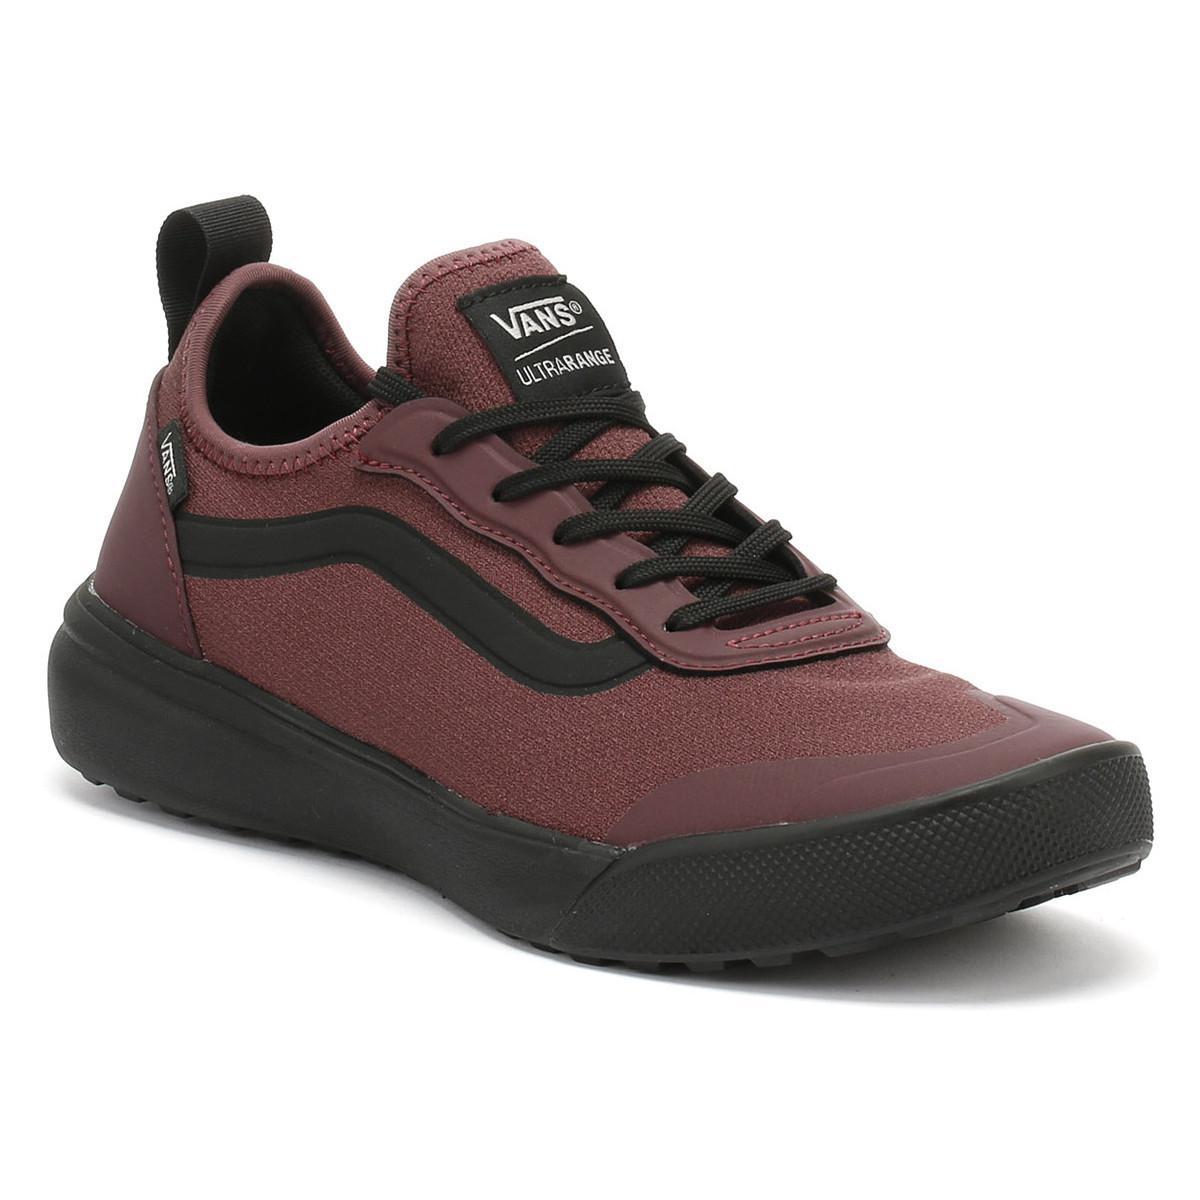 Vans - Catawba Grape Burgundy   Black Ultrarange Ac Trainers Men s Shoes  (trainers) In. View fullscreen f4bb960ee